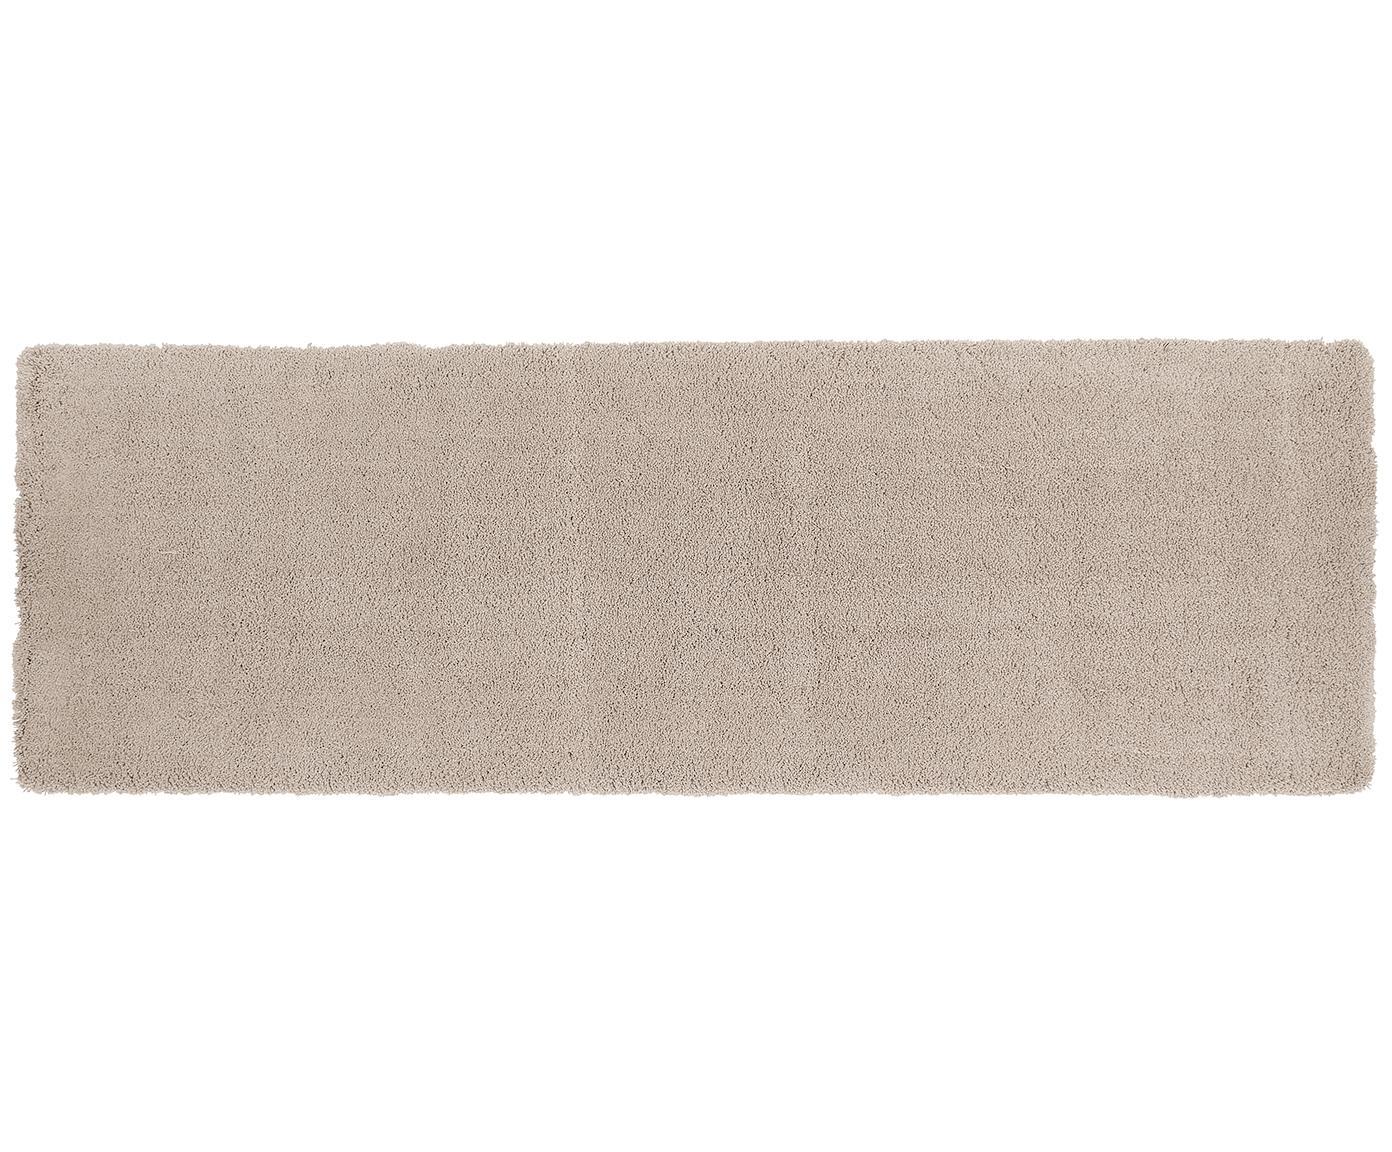 Passatoia pelosa morbida beige Leighton, Retro: 100% poliestere, Beige-marrone, Larg. 80 x Lung. 250 cm